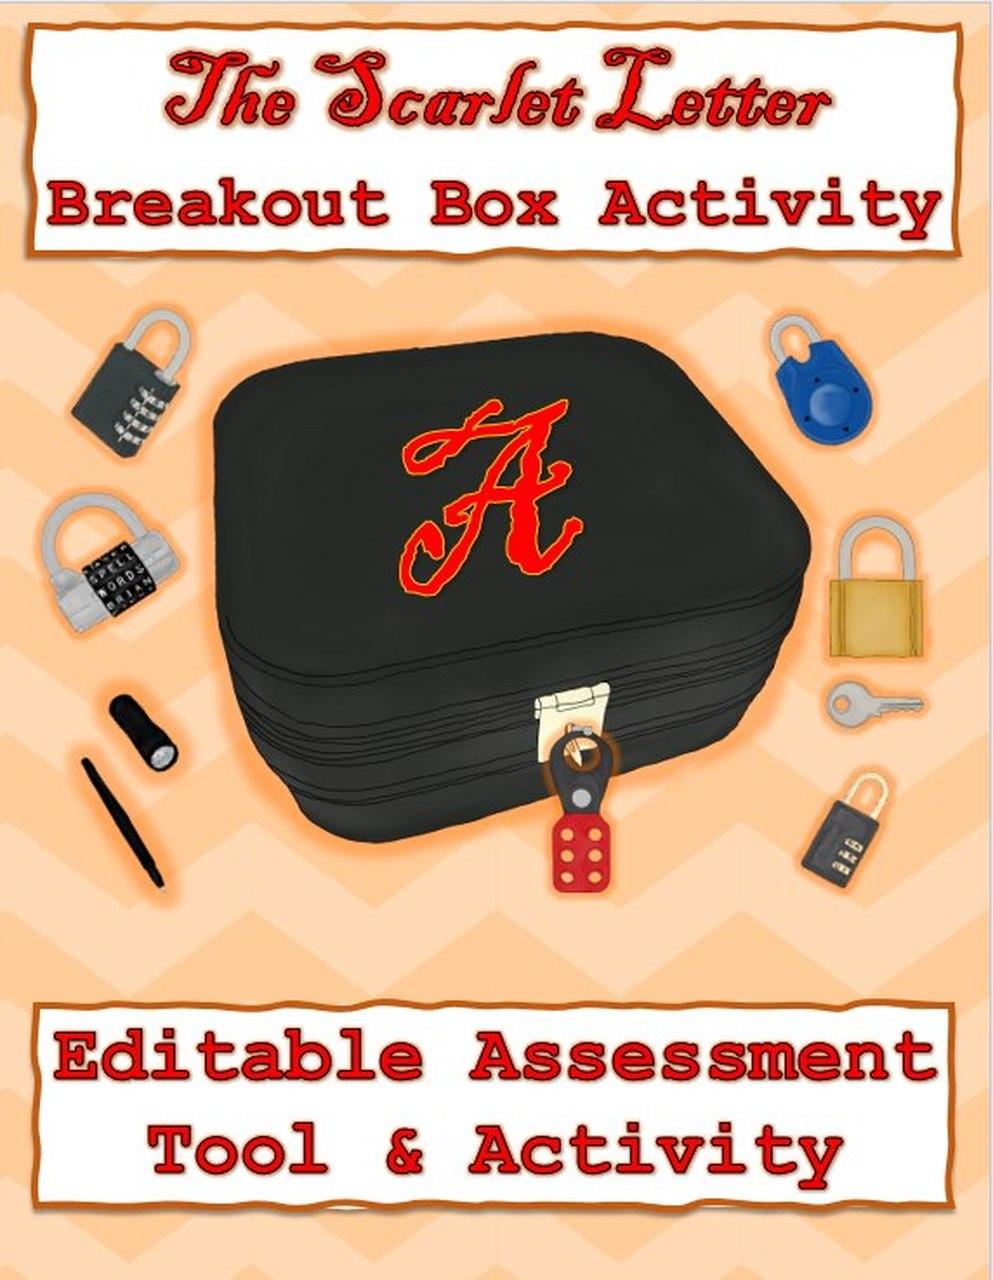 Scarlet Letter Breakout Box Breakout boxes, Scarlet